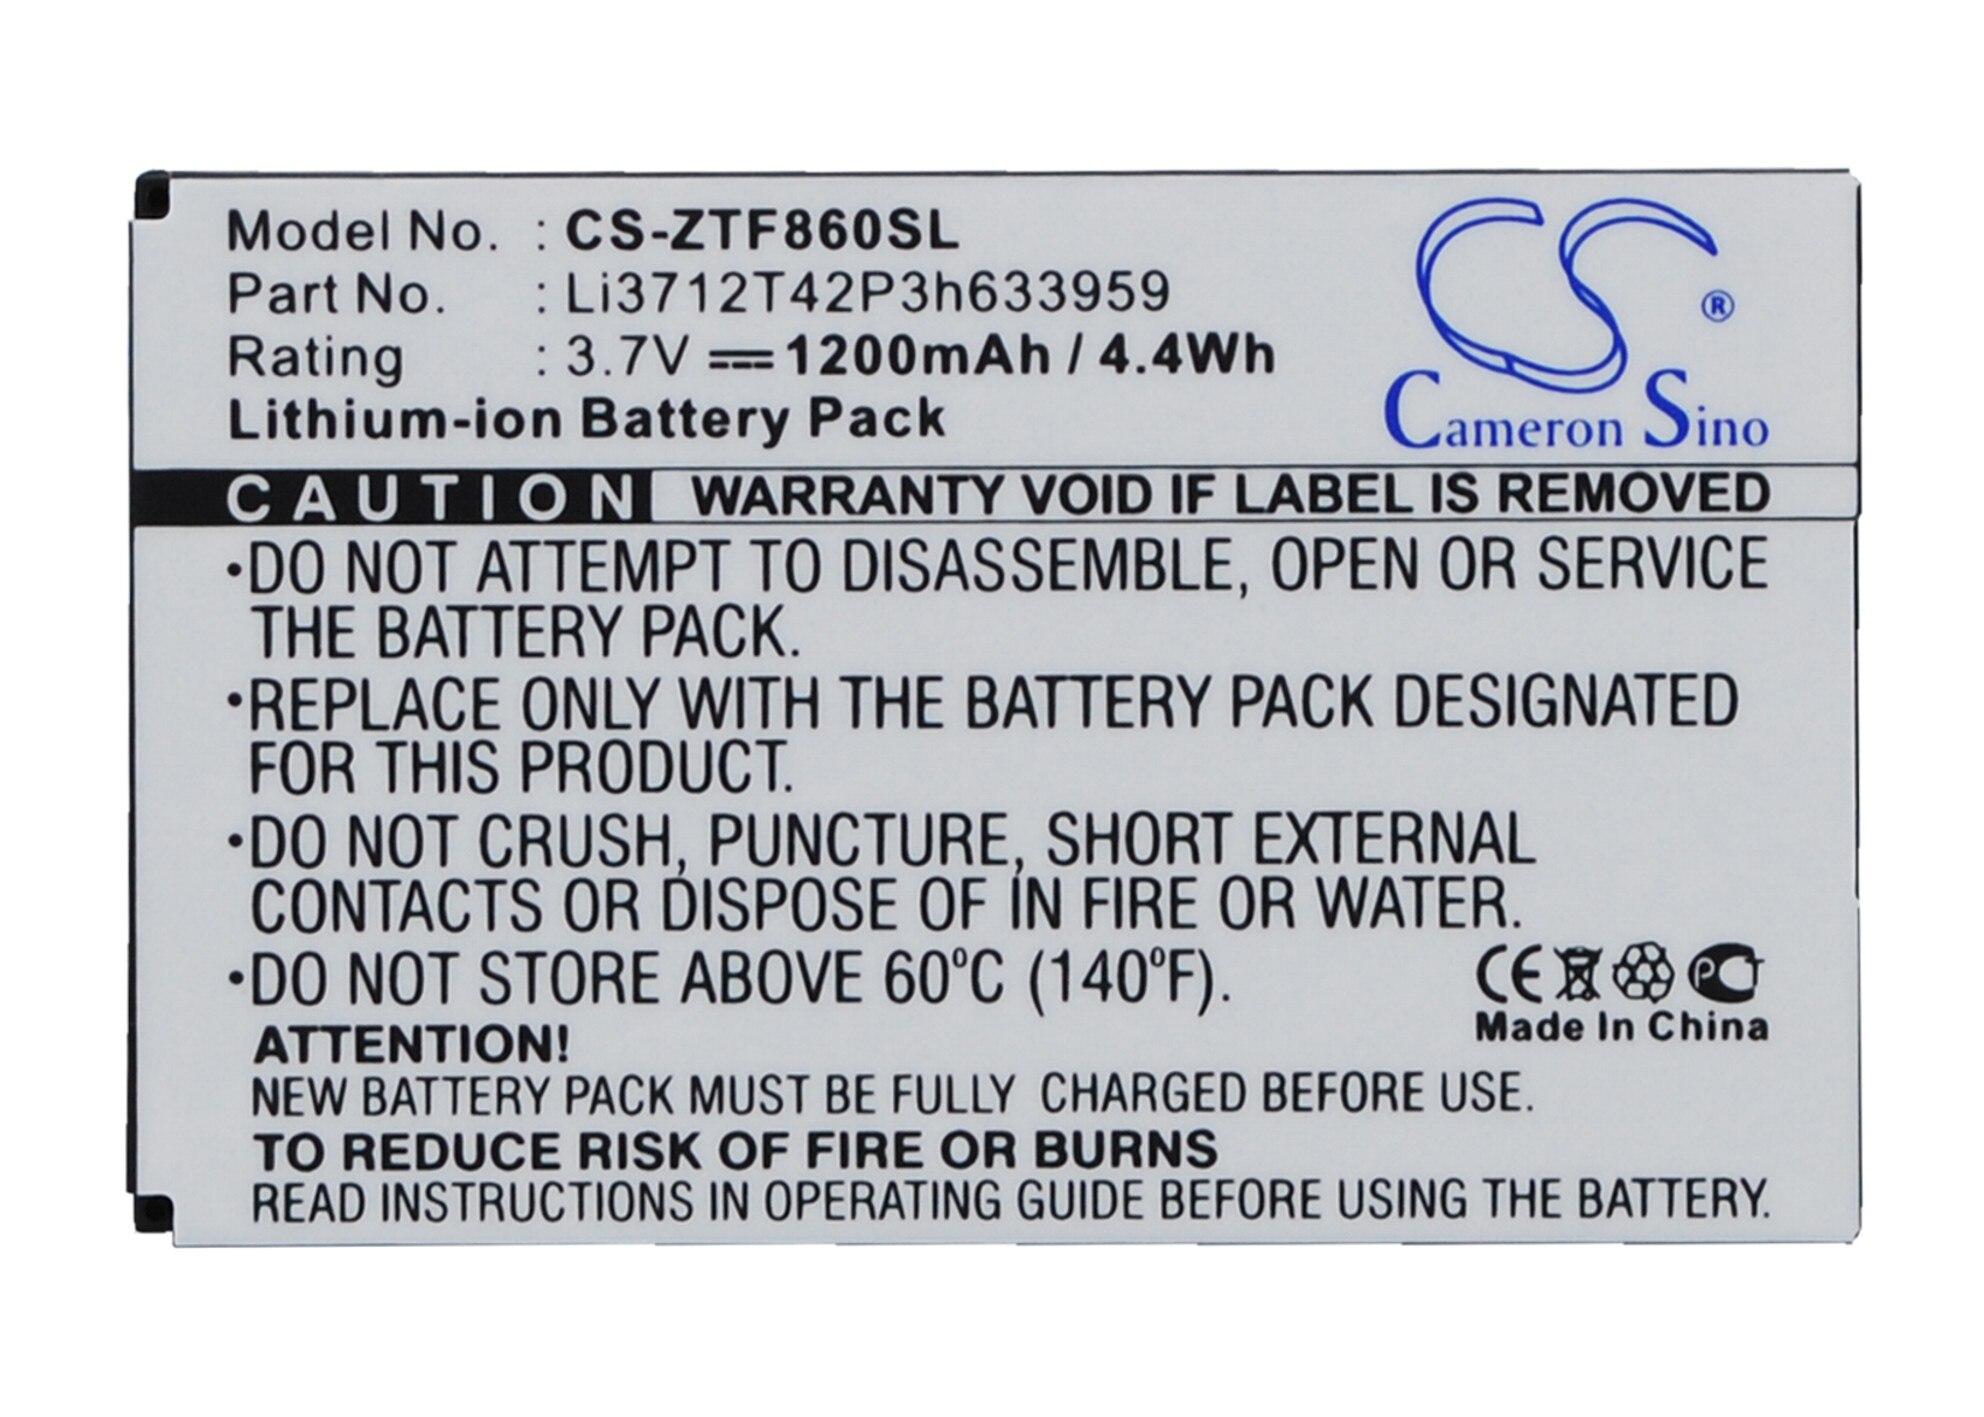 Bateria li3712t42p3h633959 de cameron sino 1200 mah para zte/telstra e700 f860 f868 f866, i909